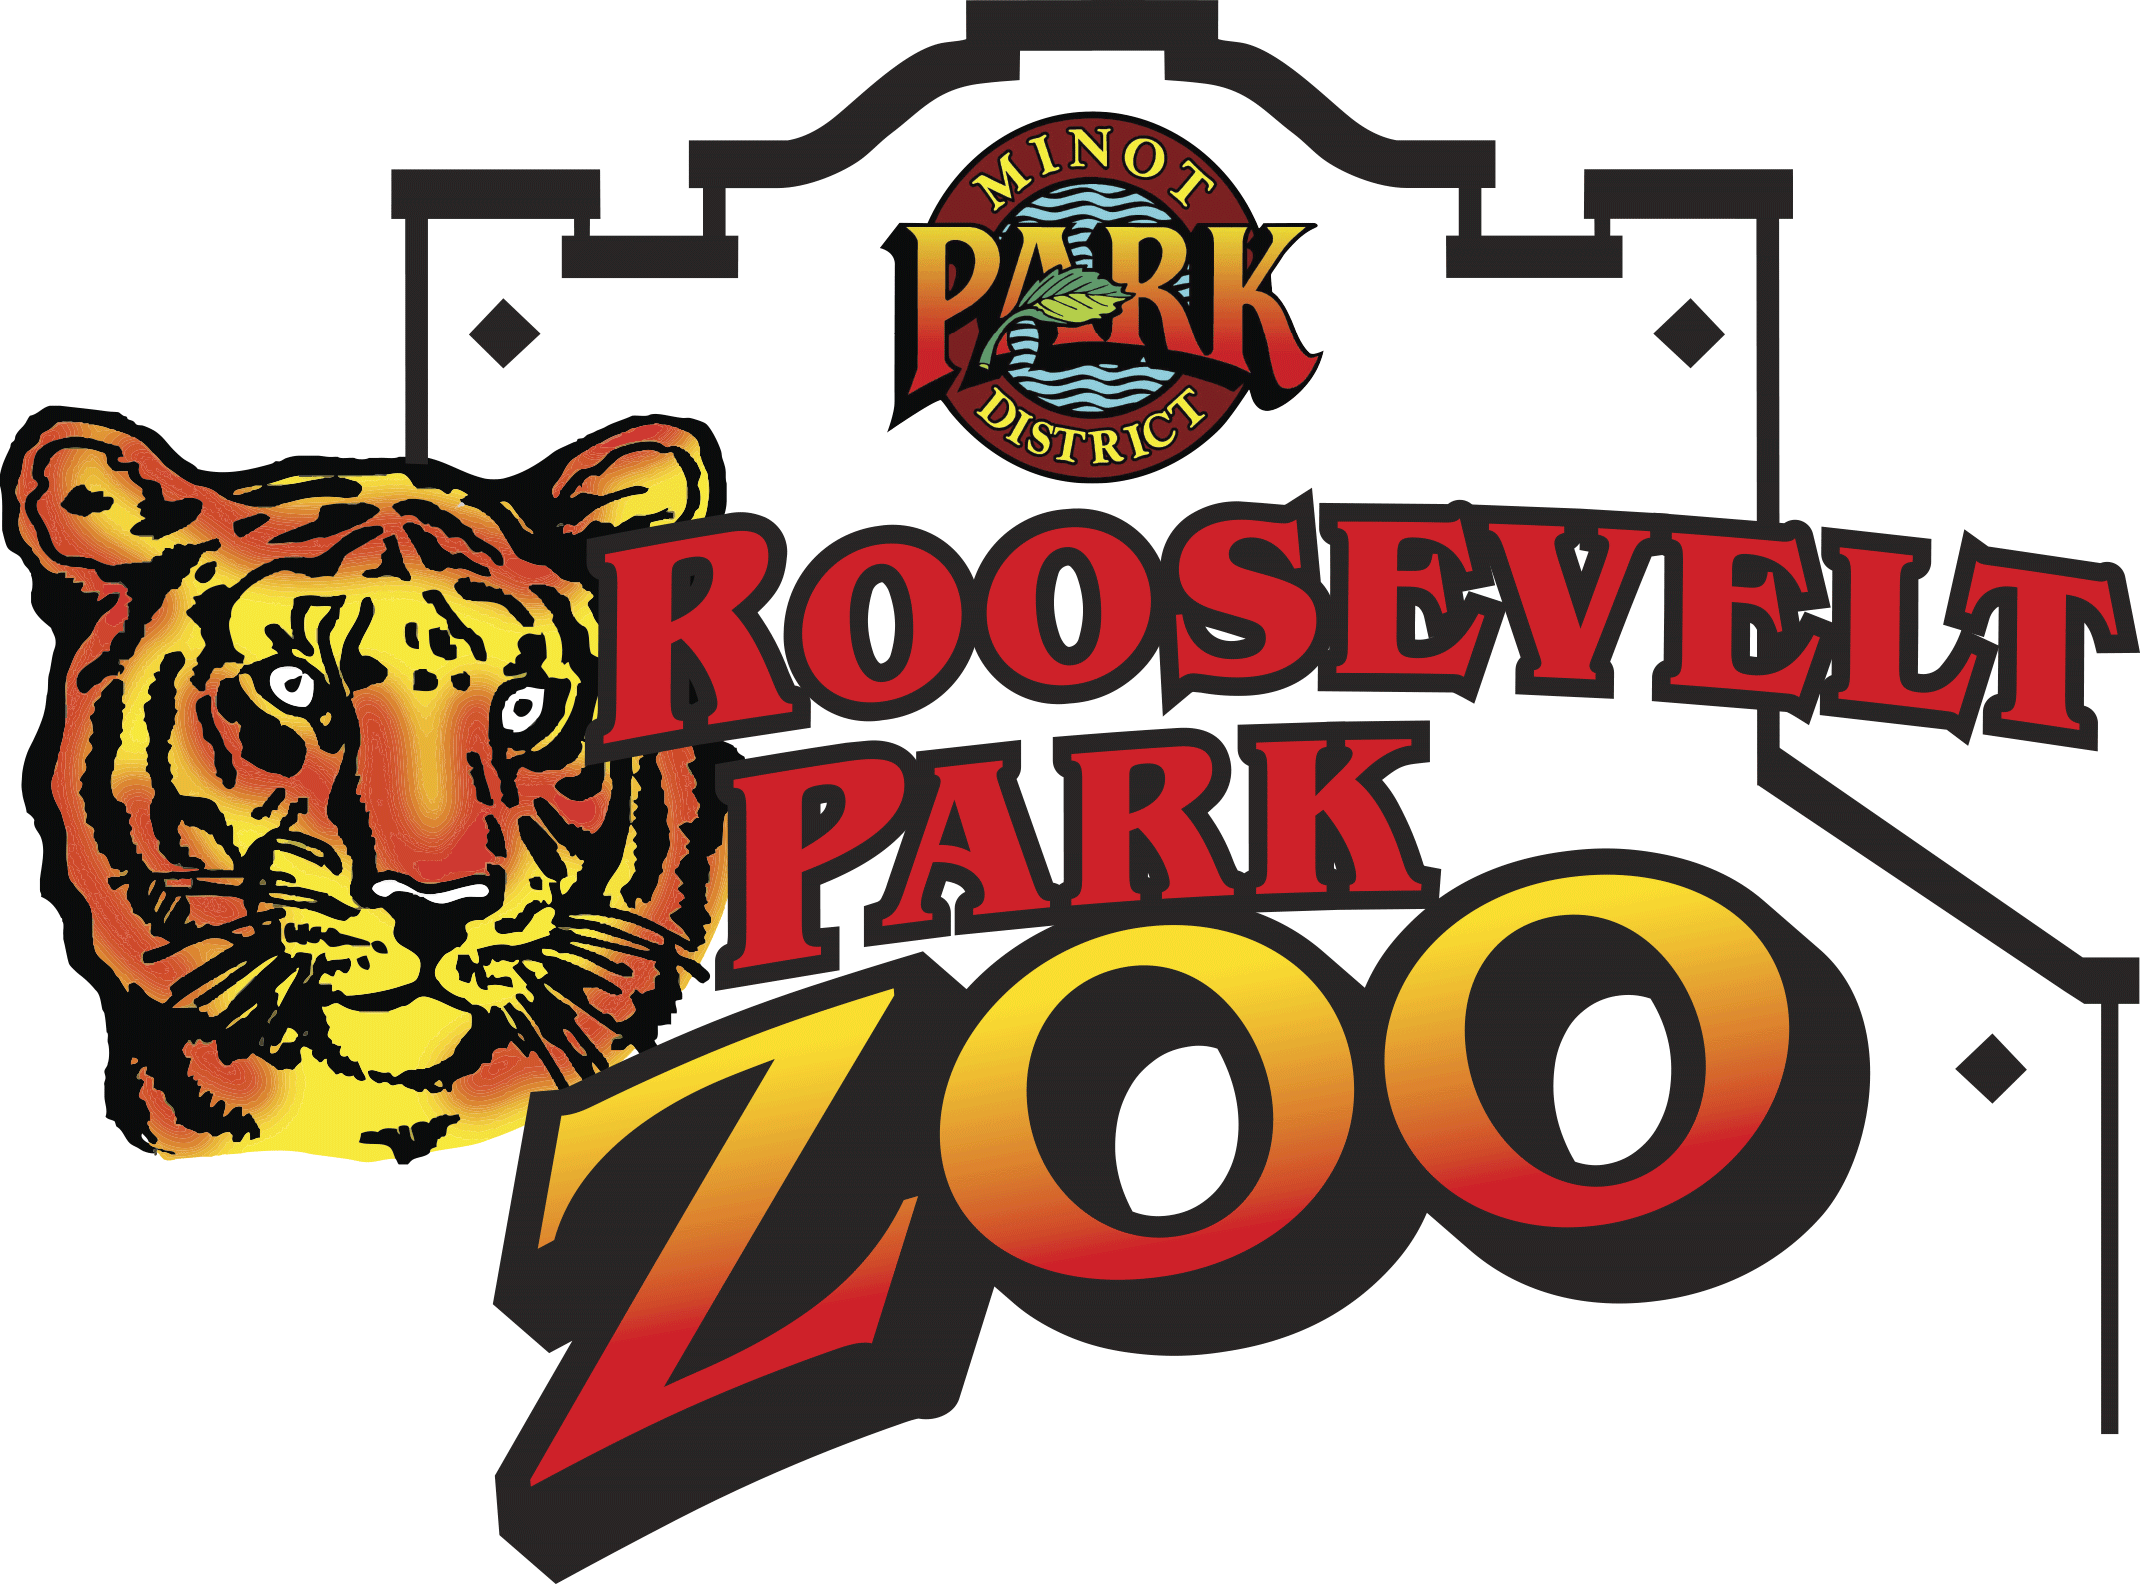 Roosevelt Park Zoo